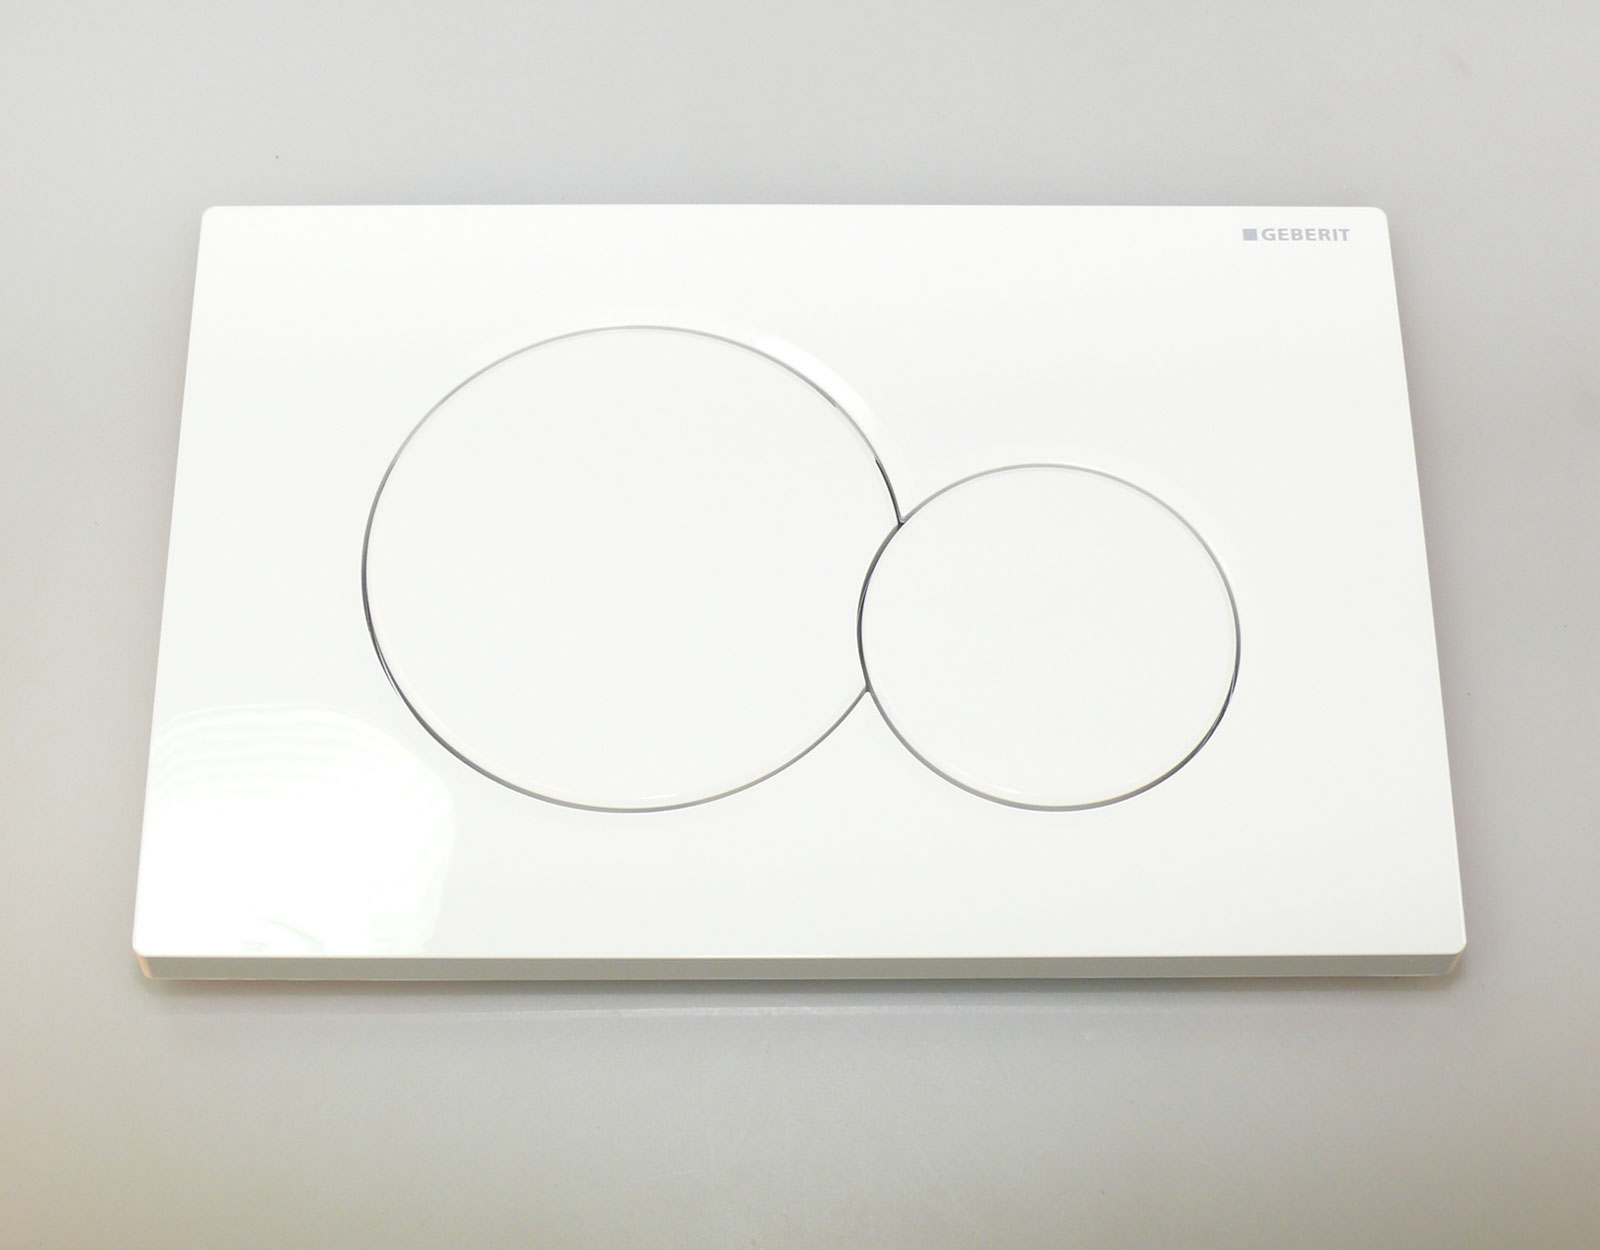 geberit bet tigungsplatte sigma01 abdeckplatte. Black Bedroom Furniture Sets. Home Design Ideas